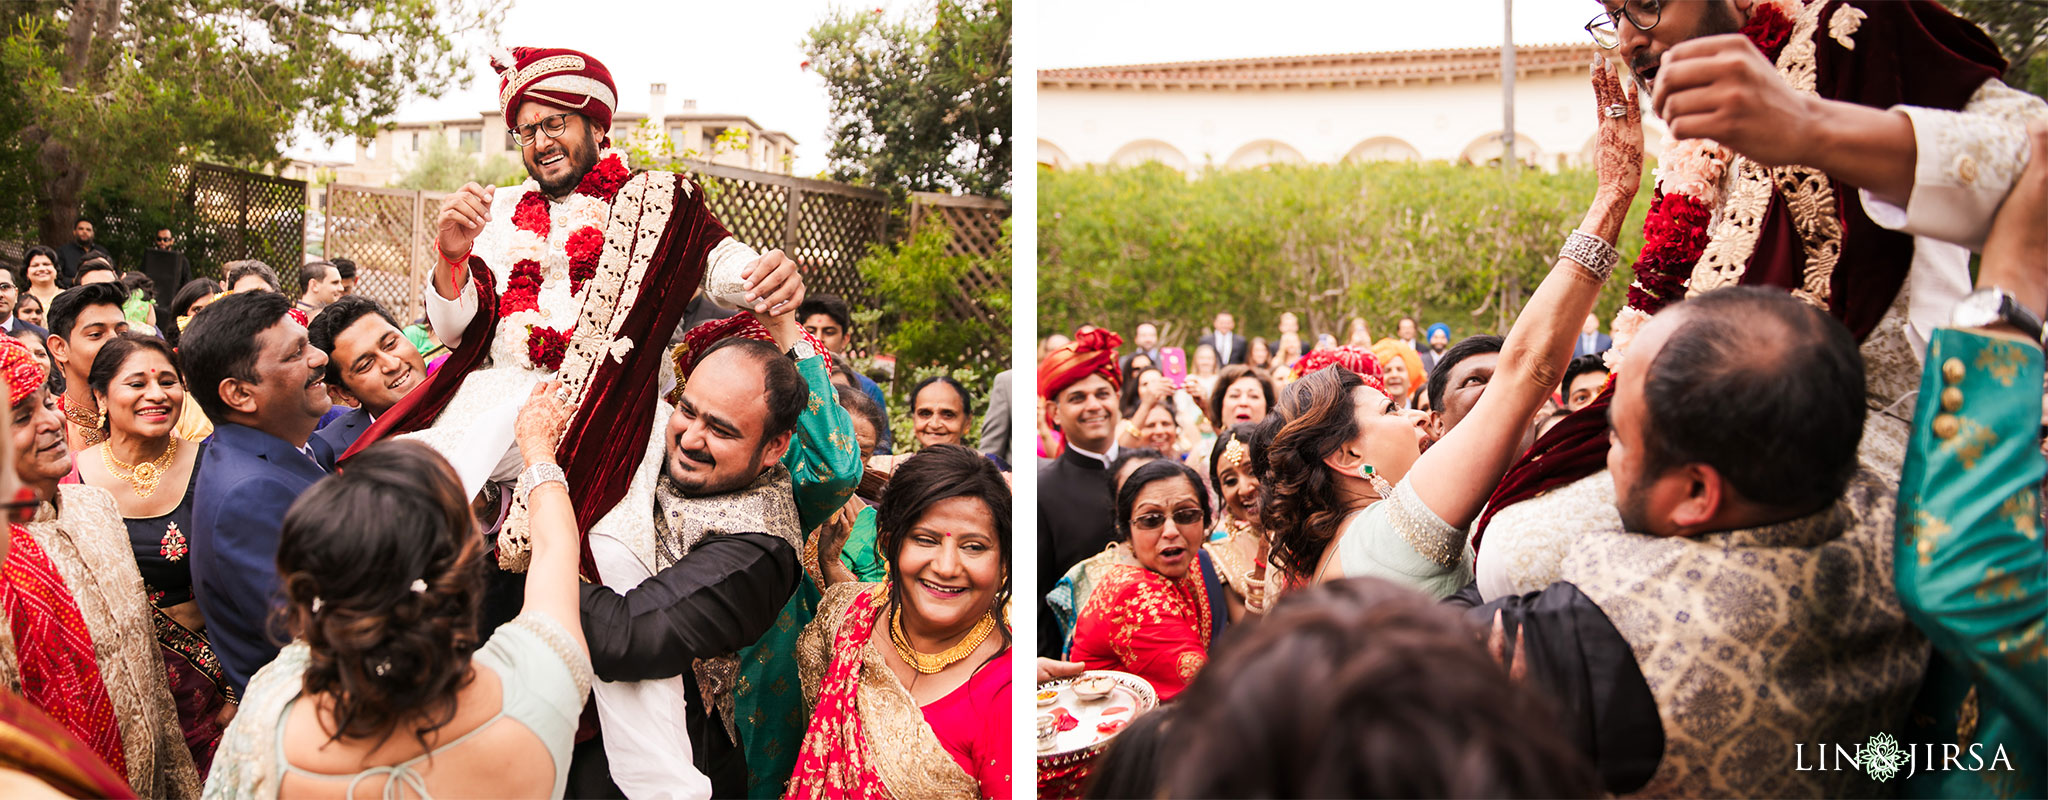 015 monarch beach resort dana point indian wedding baraat photography